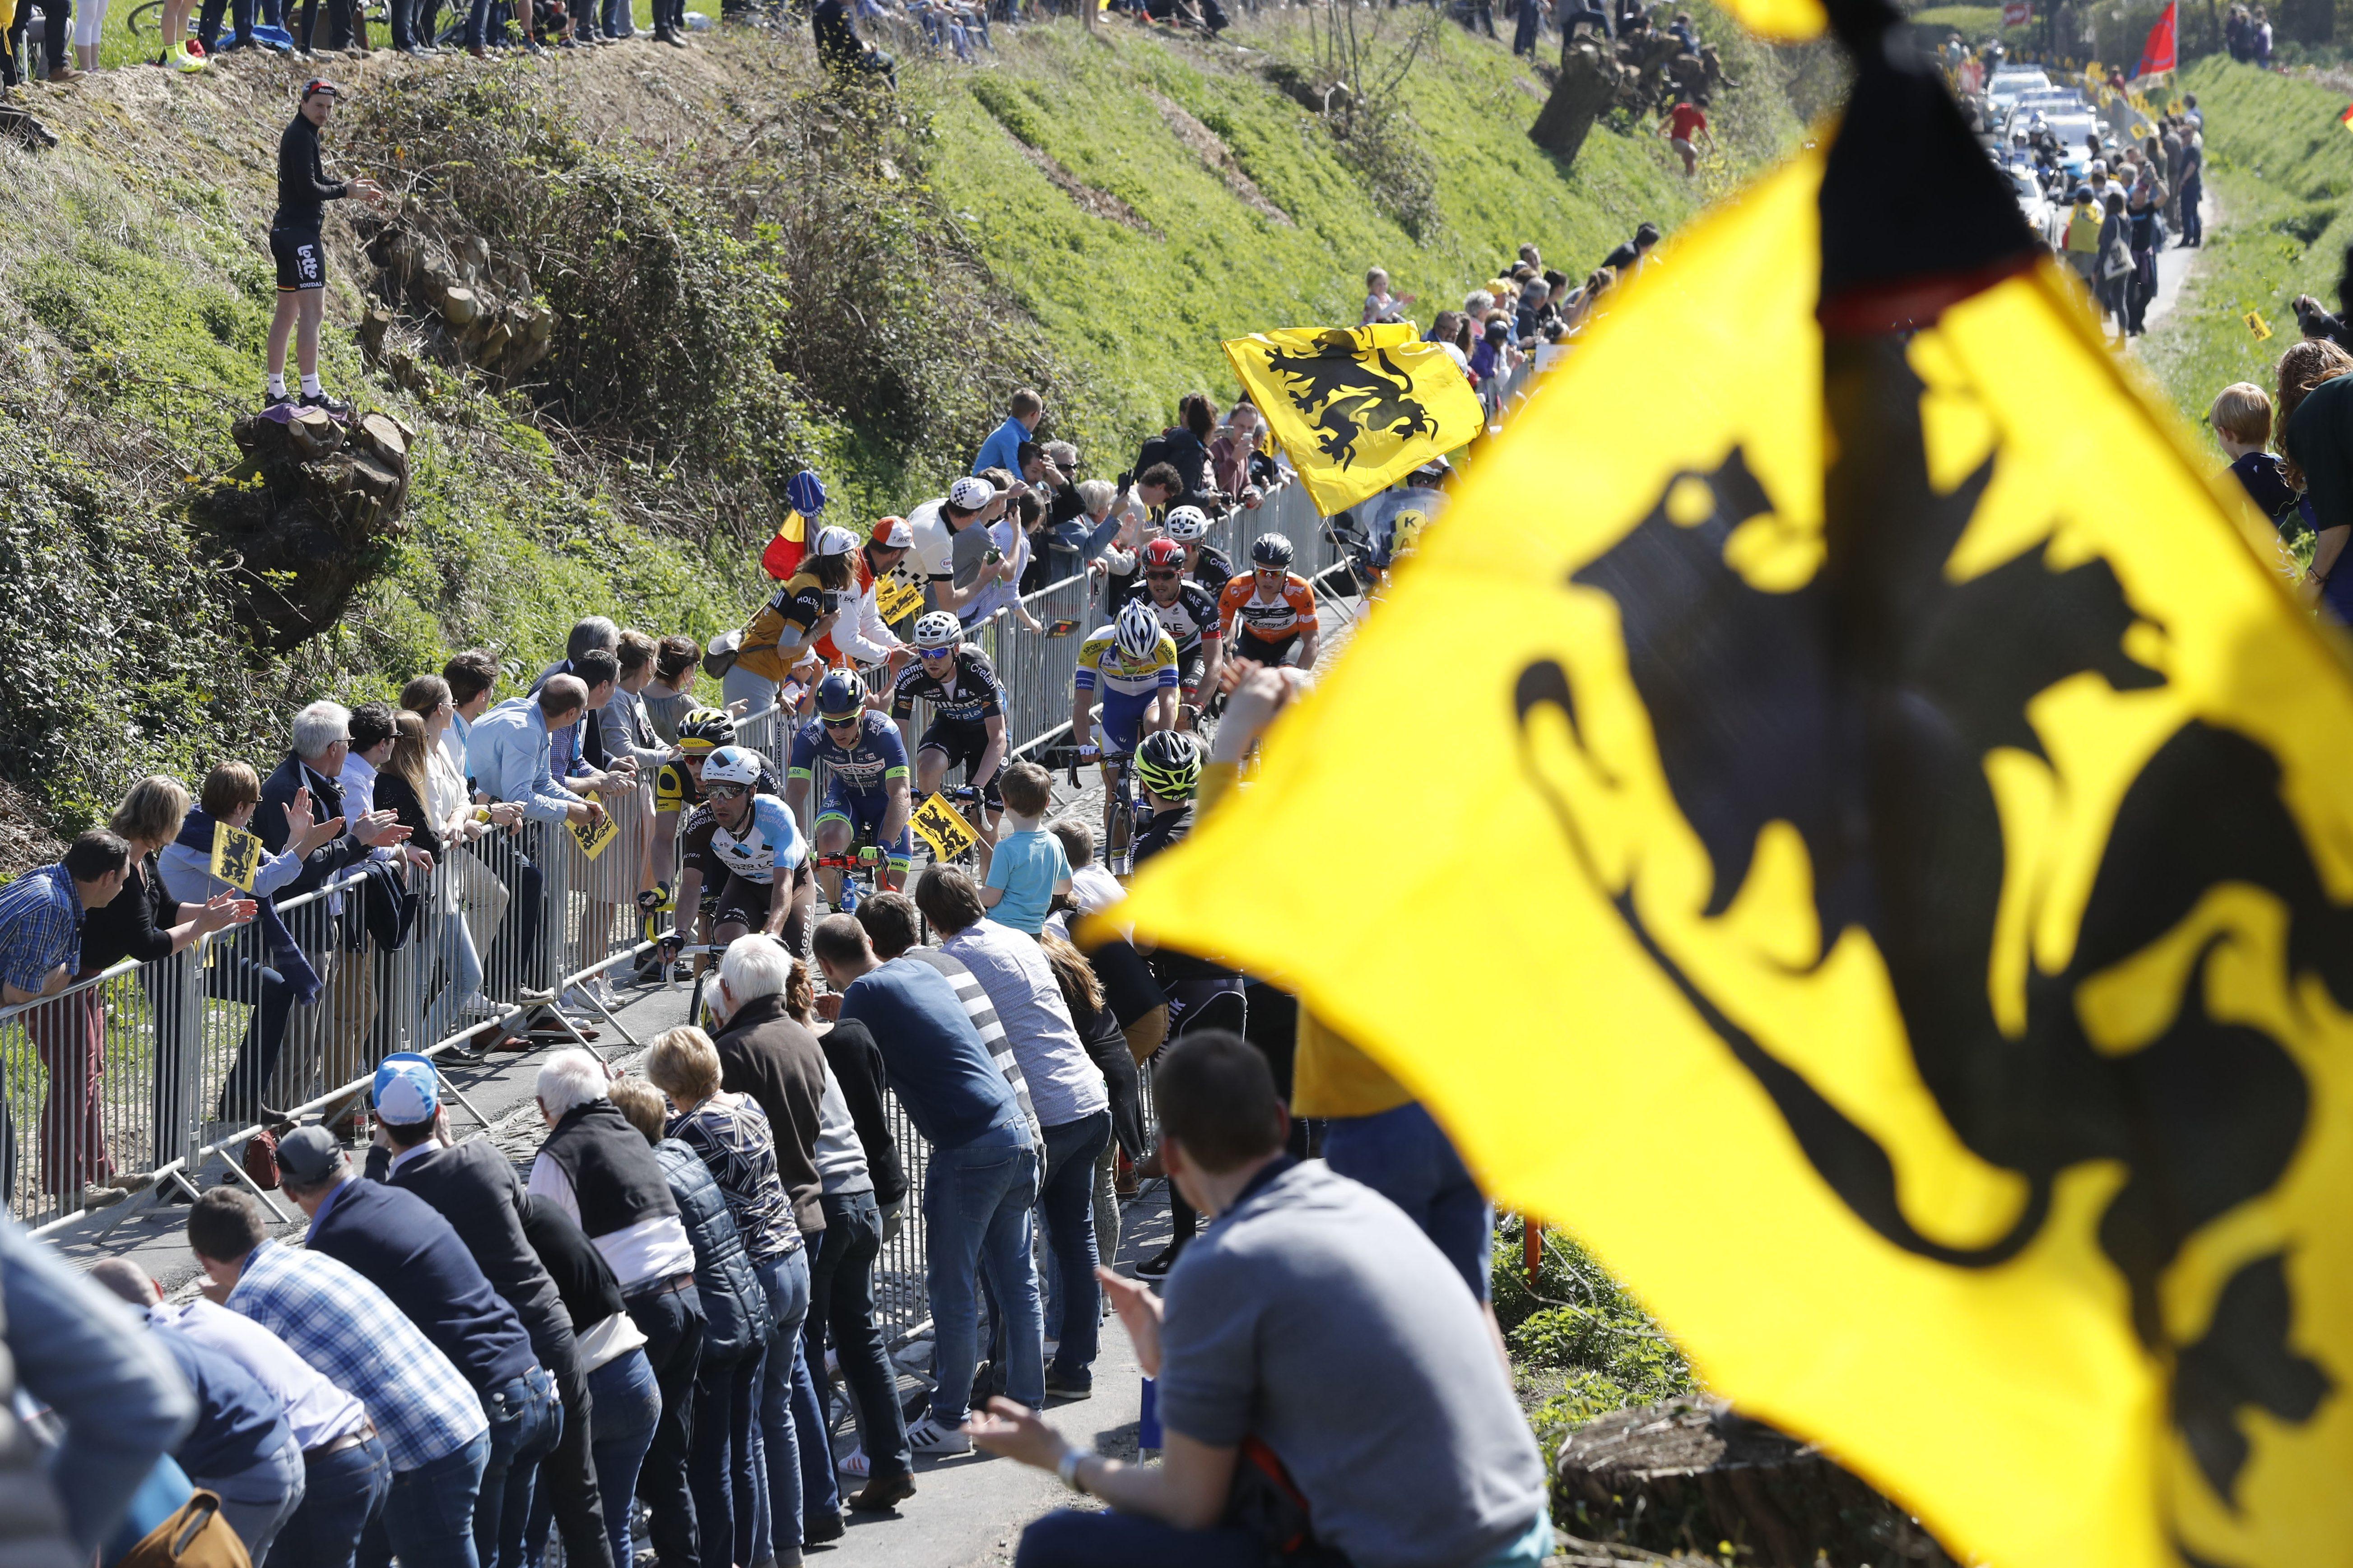 Tour of Flanders 2019 start list